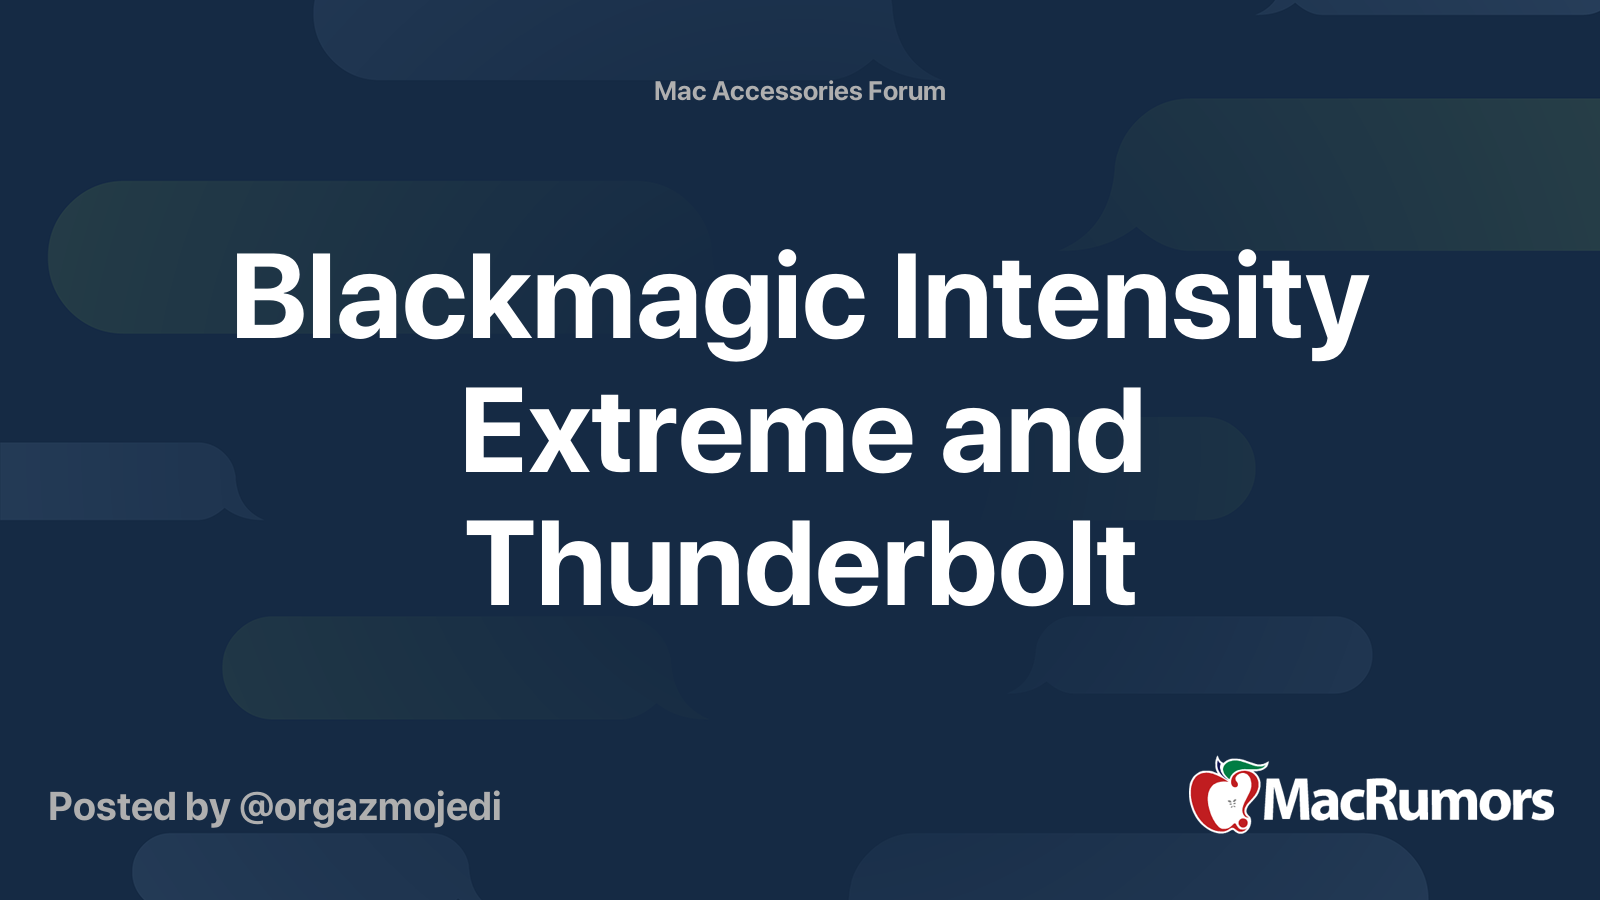 Blackmagic Intensity Extreme And Thunderbolt Macrumors Forums